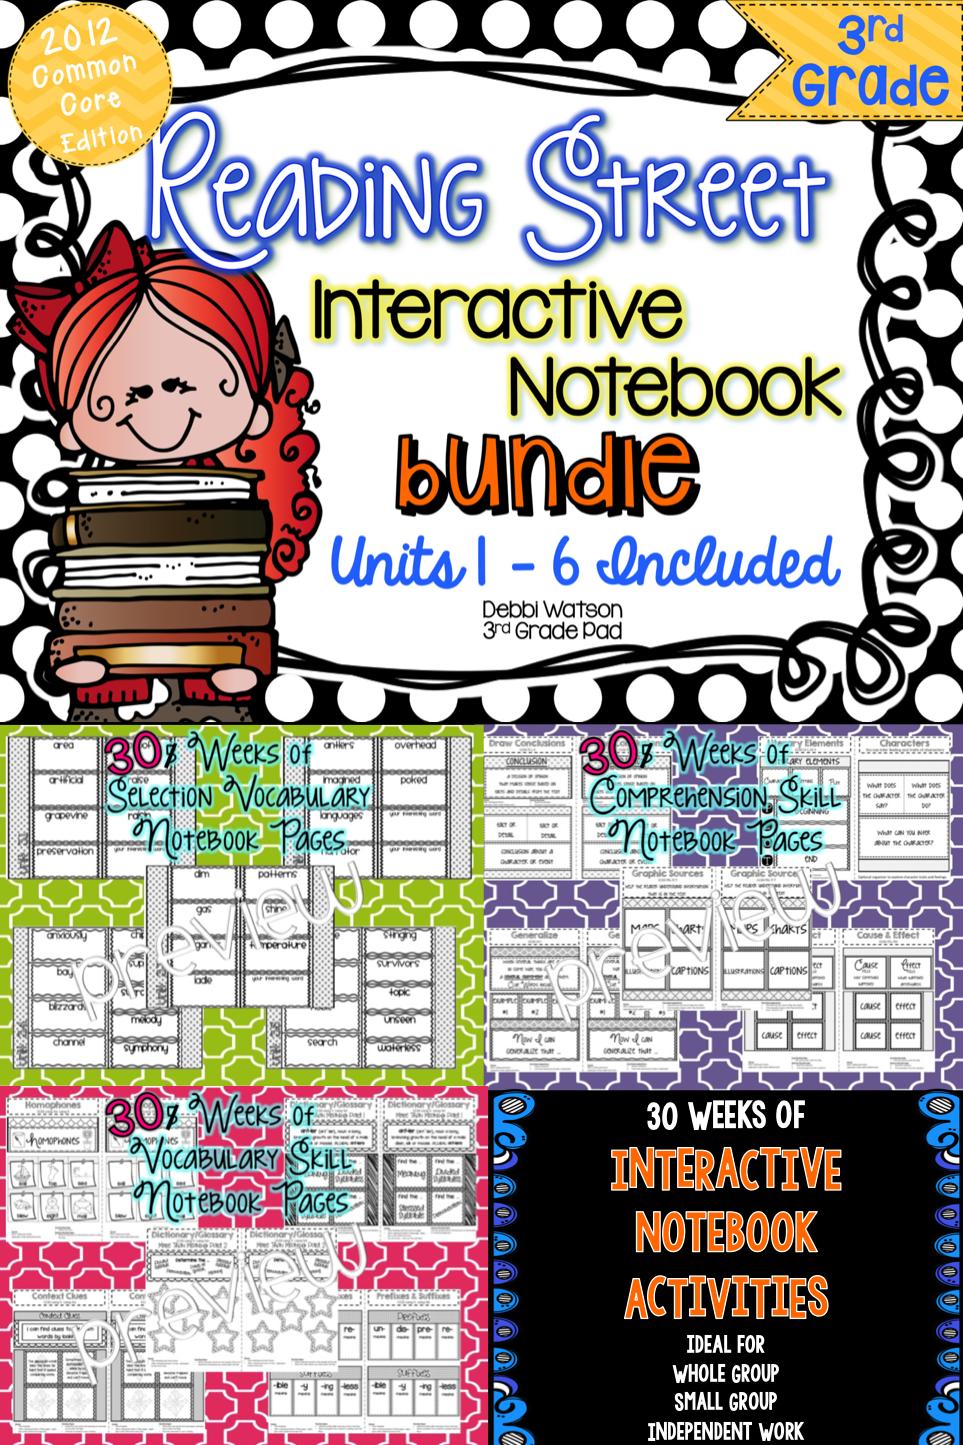 Reading Street 3rd Grade Interactive Notebook BUNDLE